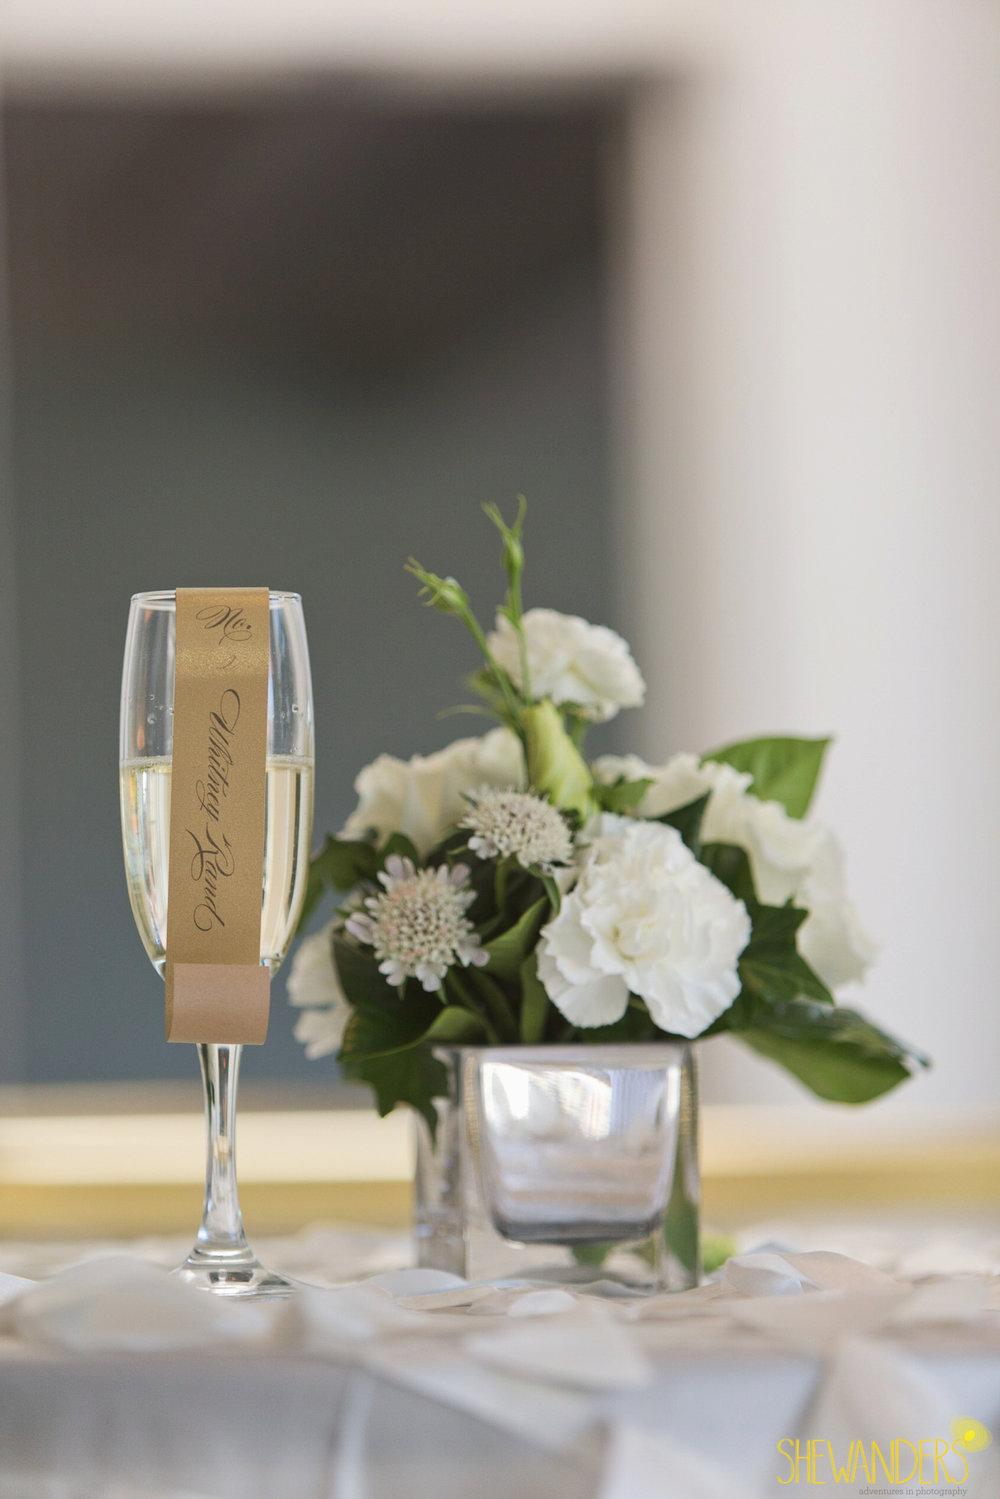 Shewanders.Coronado.Wedding.LaurenJessica-1029.jpg.Wedding.LaurenJessica-1029.jpg